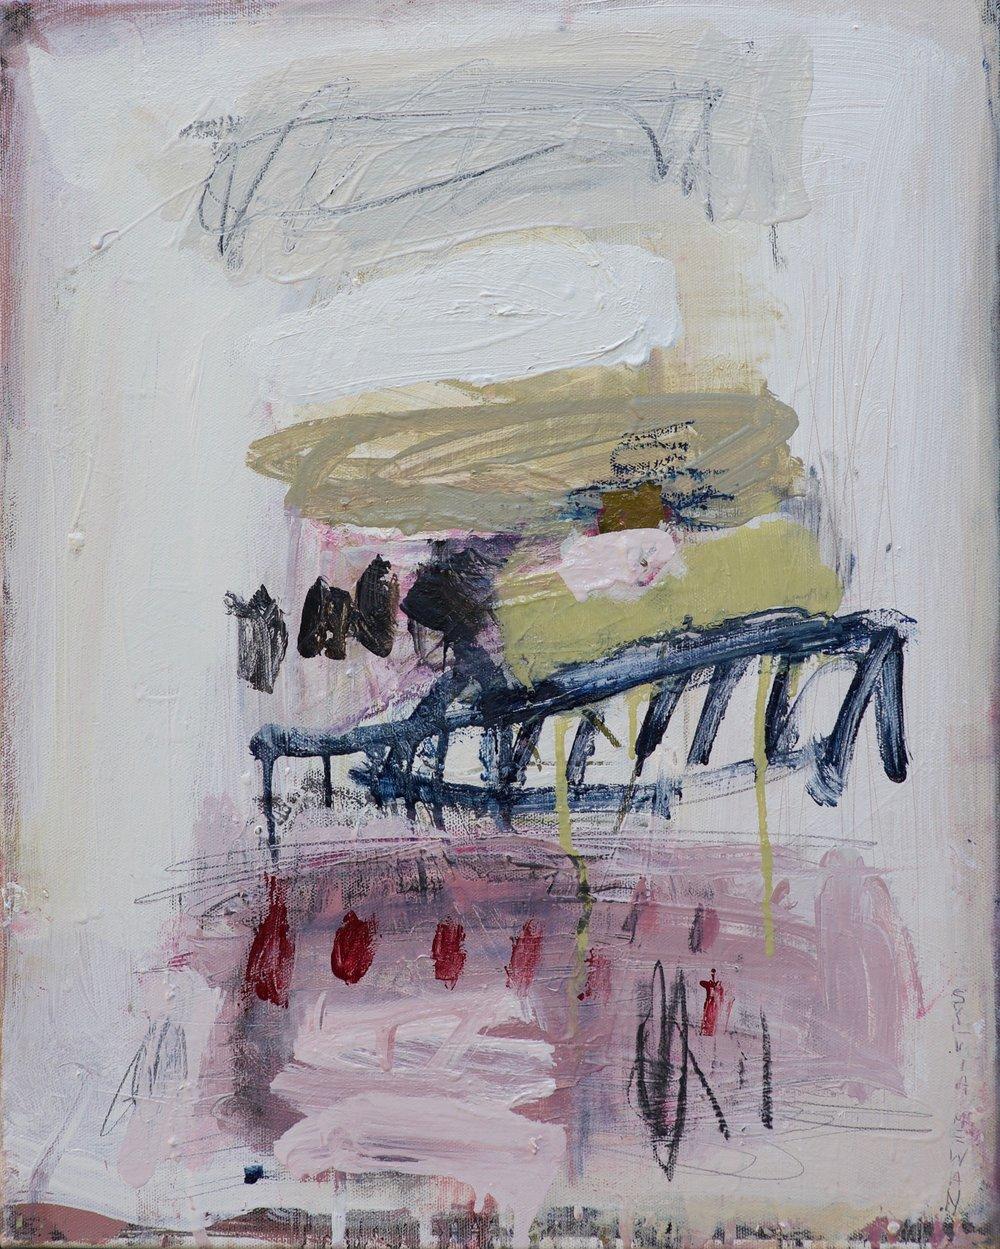 Untitled No. 36